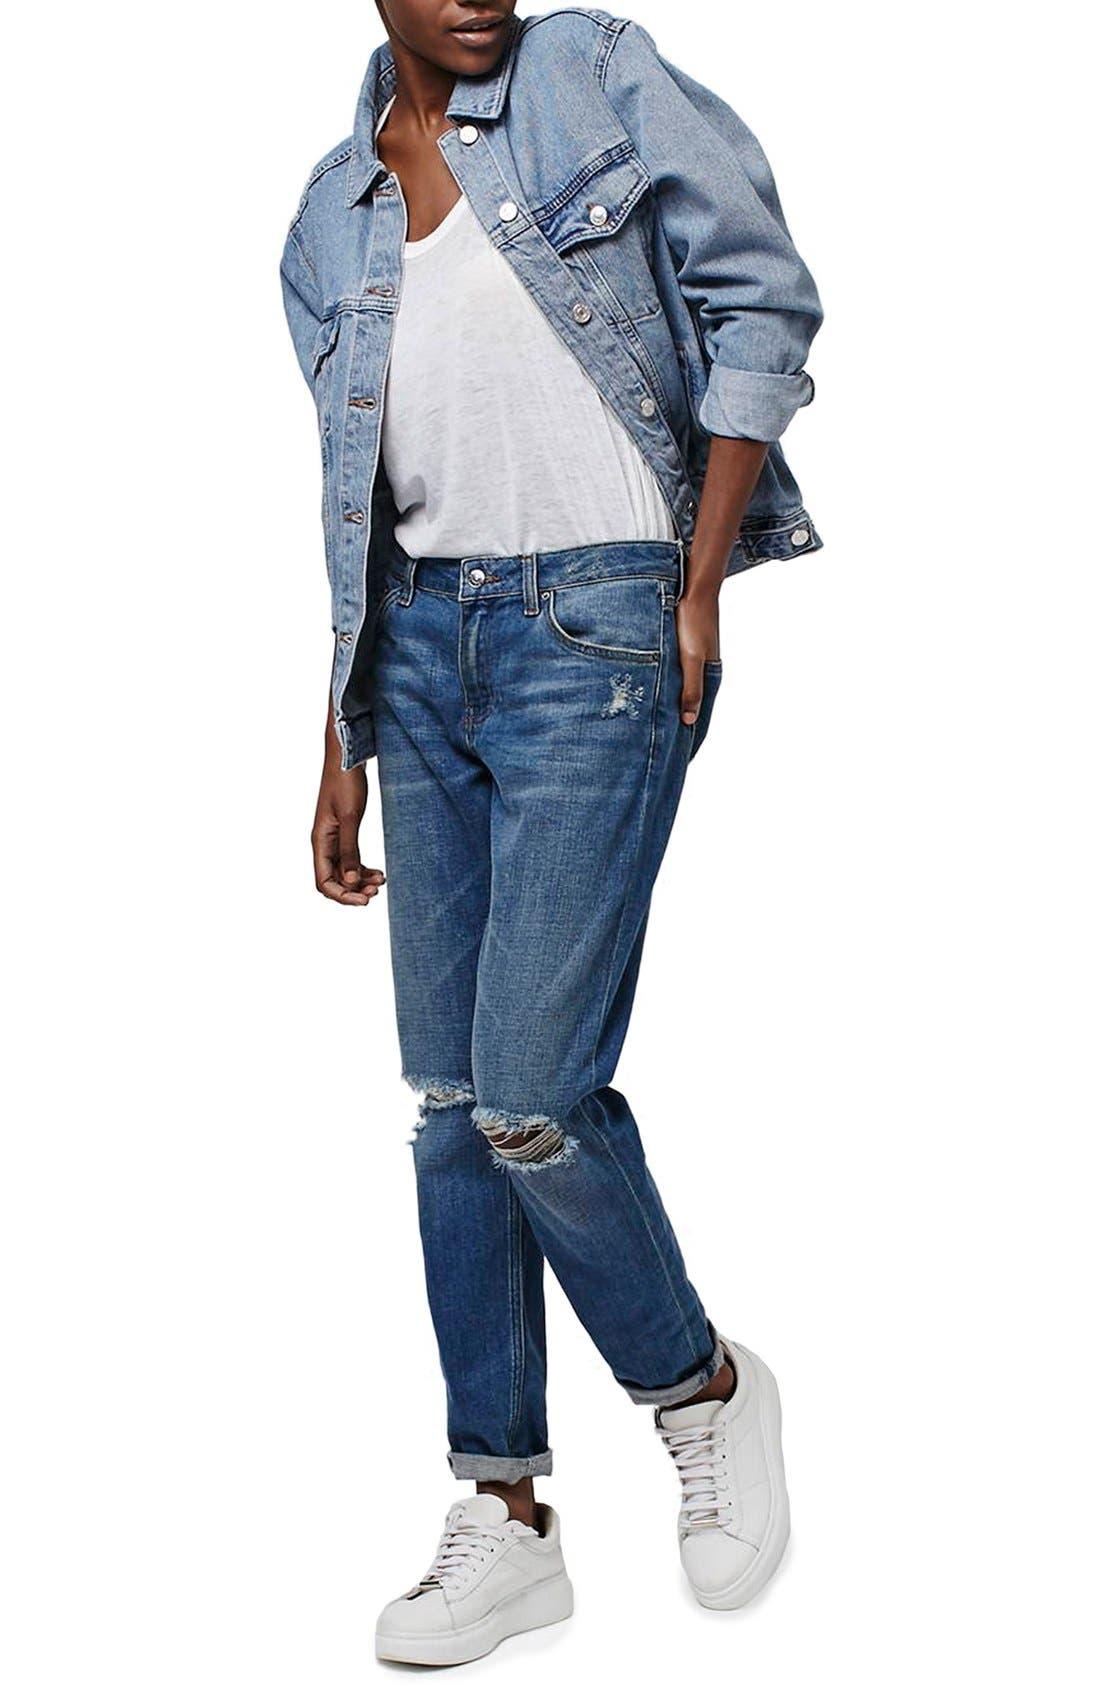 Alternate Image 1 Selected - Topshop Oversize Denim Jacket (Regular & Petite)